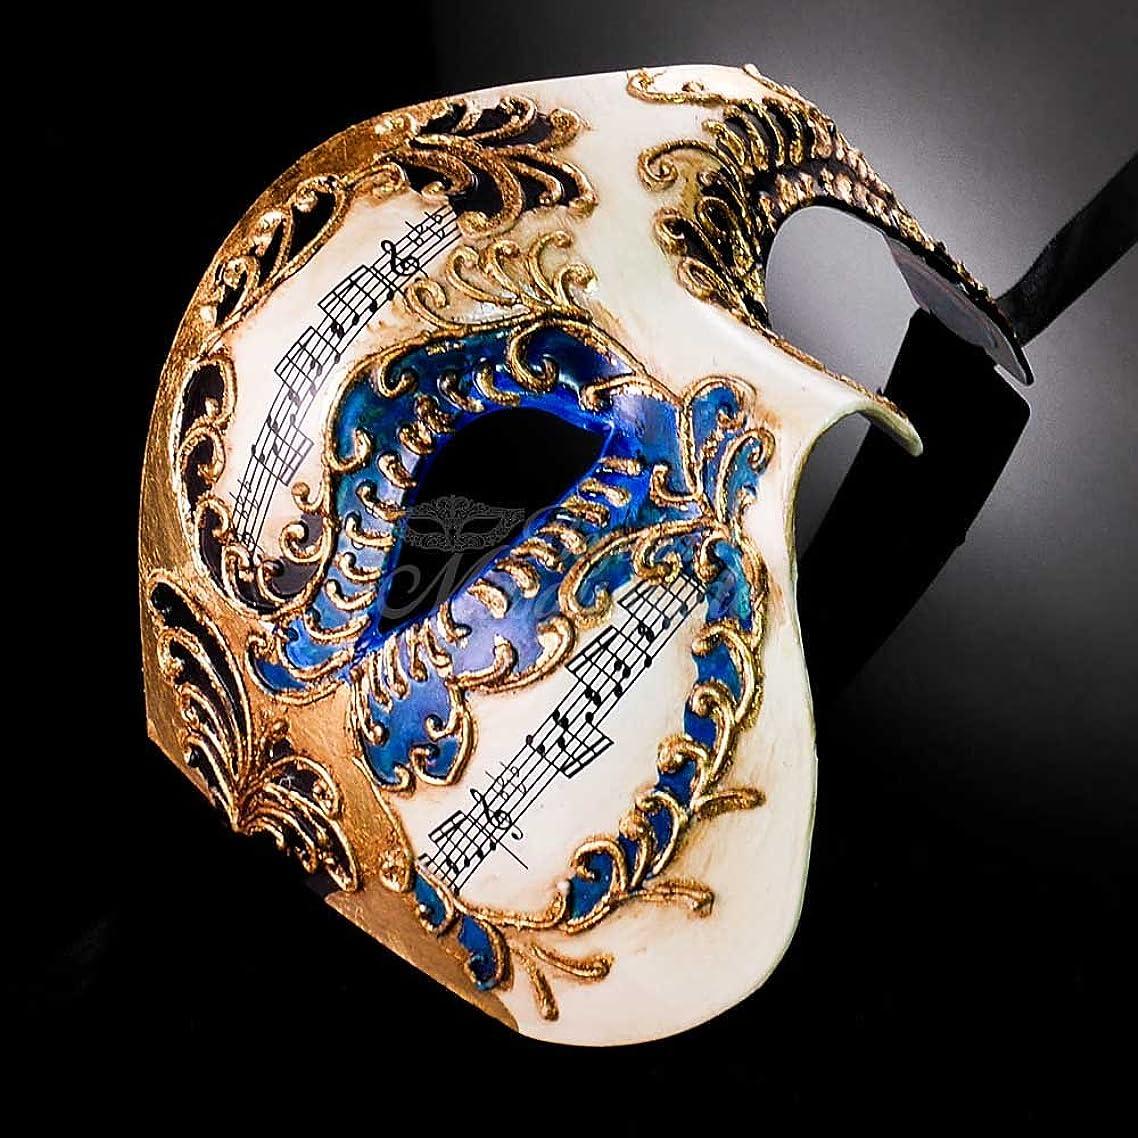 Gold Lining Musical Blue Venetian Half Masquerade Mask Phantom Design by Chom